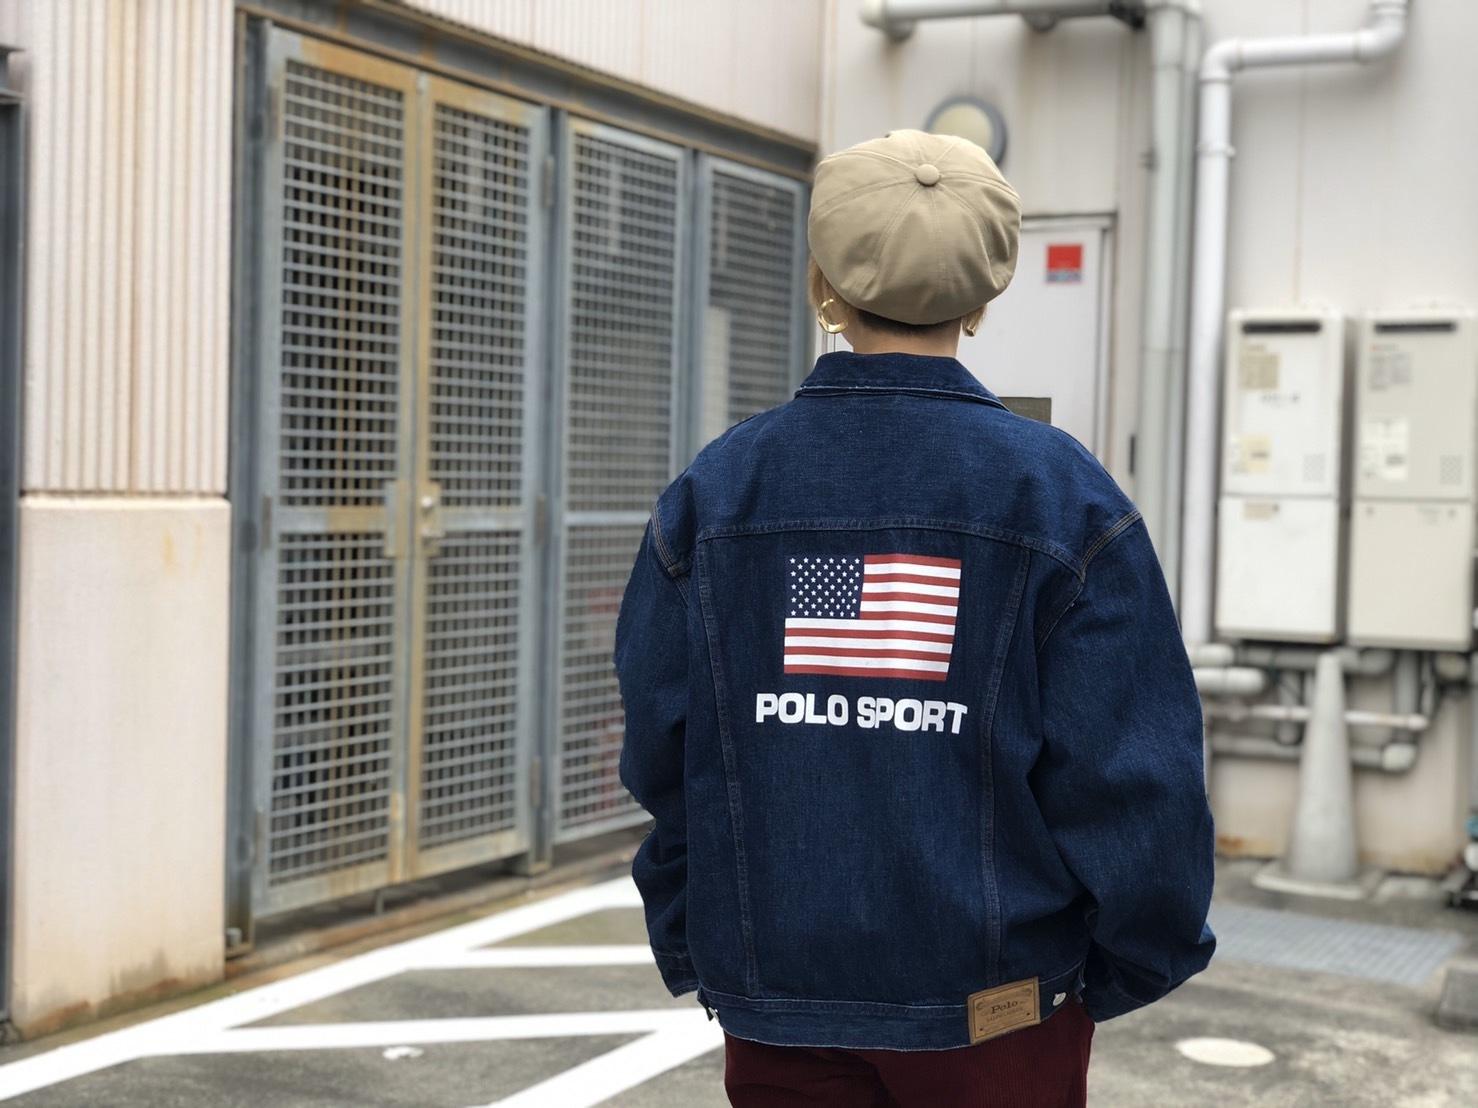 POLO SPORT US FLAG DENIM JACKET!!!_a0221253_22000052.jpg